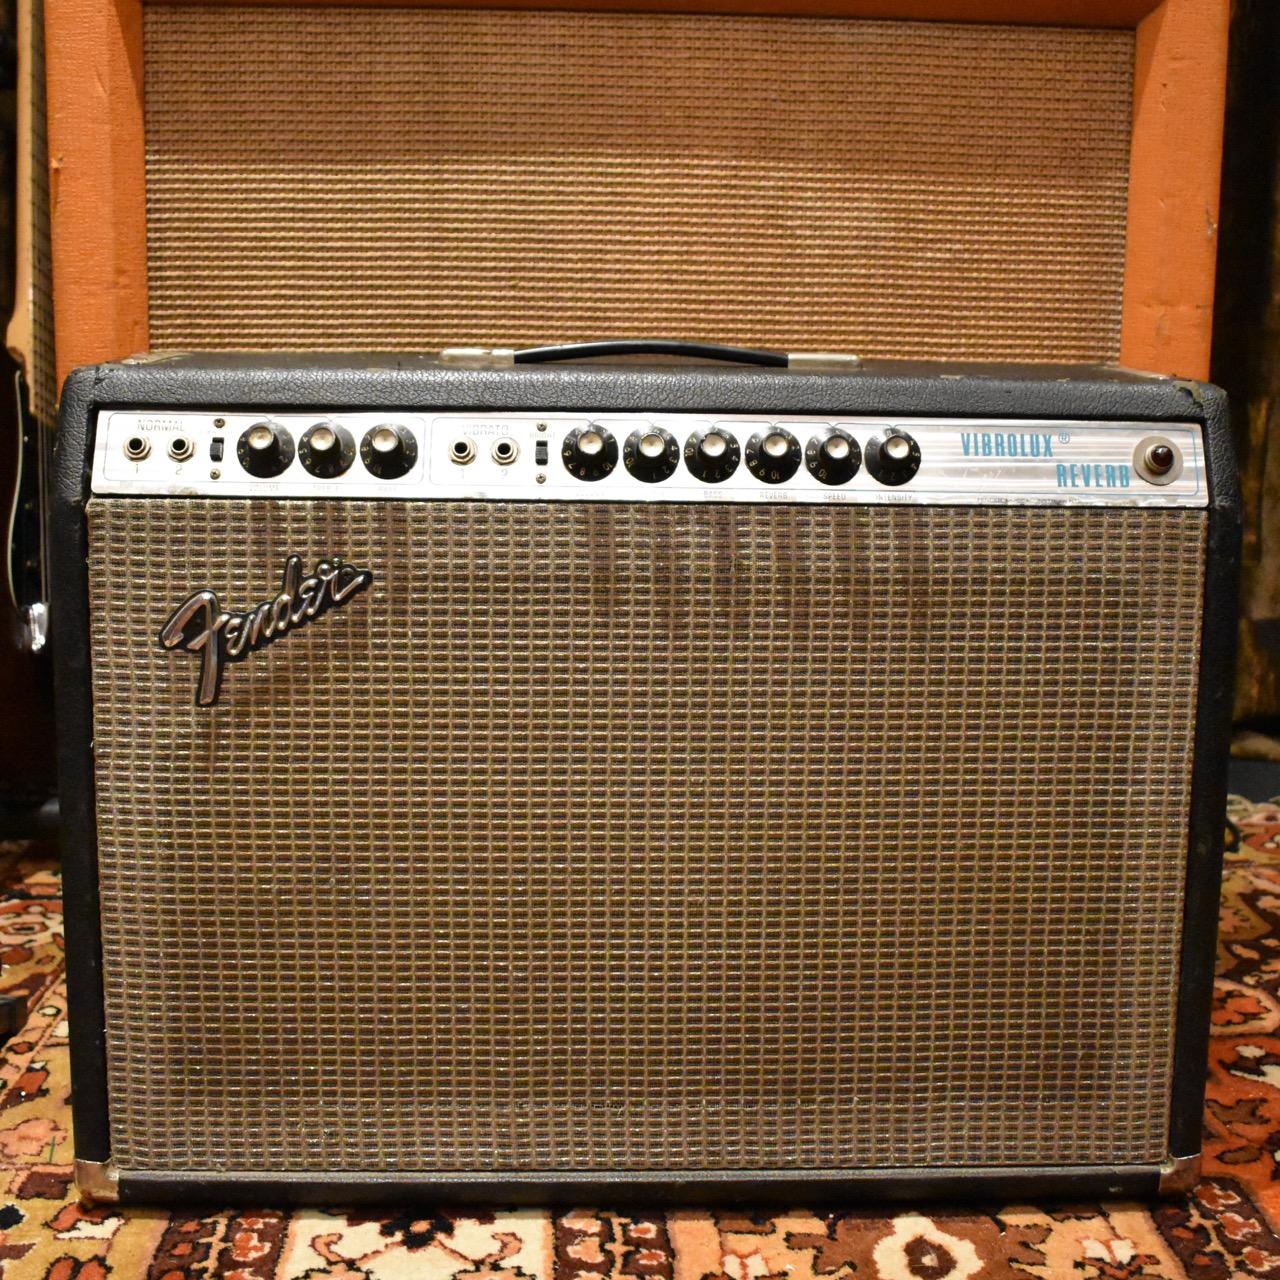 Vintage 1974 Fender Vibrolux Reverb 2x10 Silverface Combo Amp